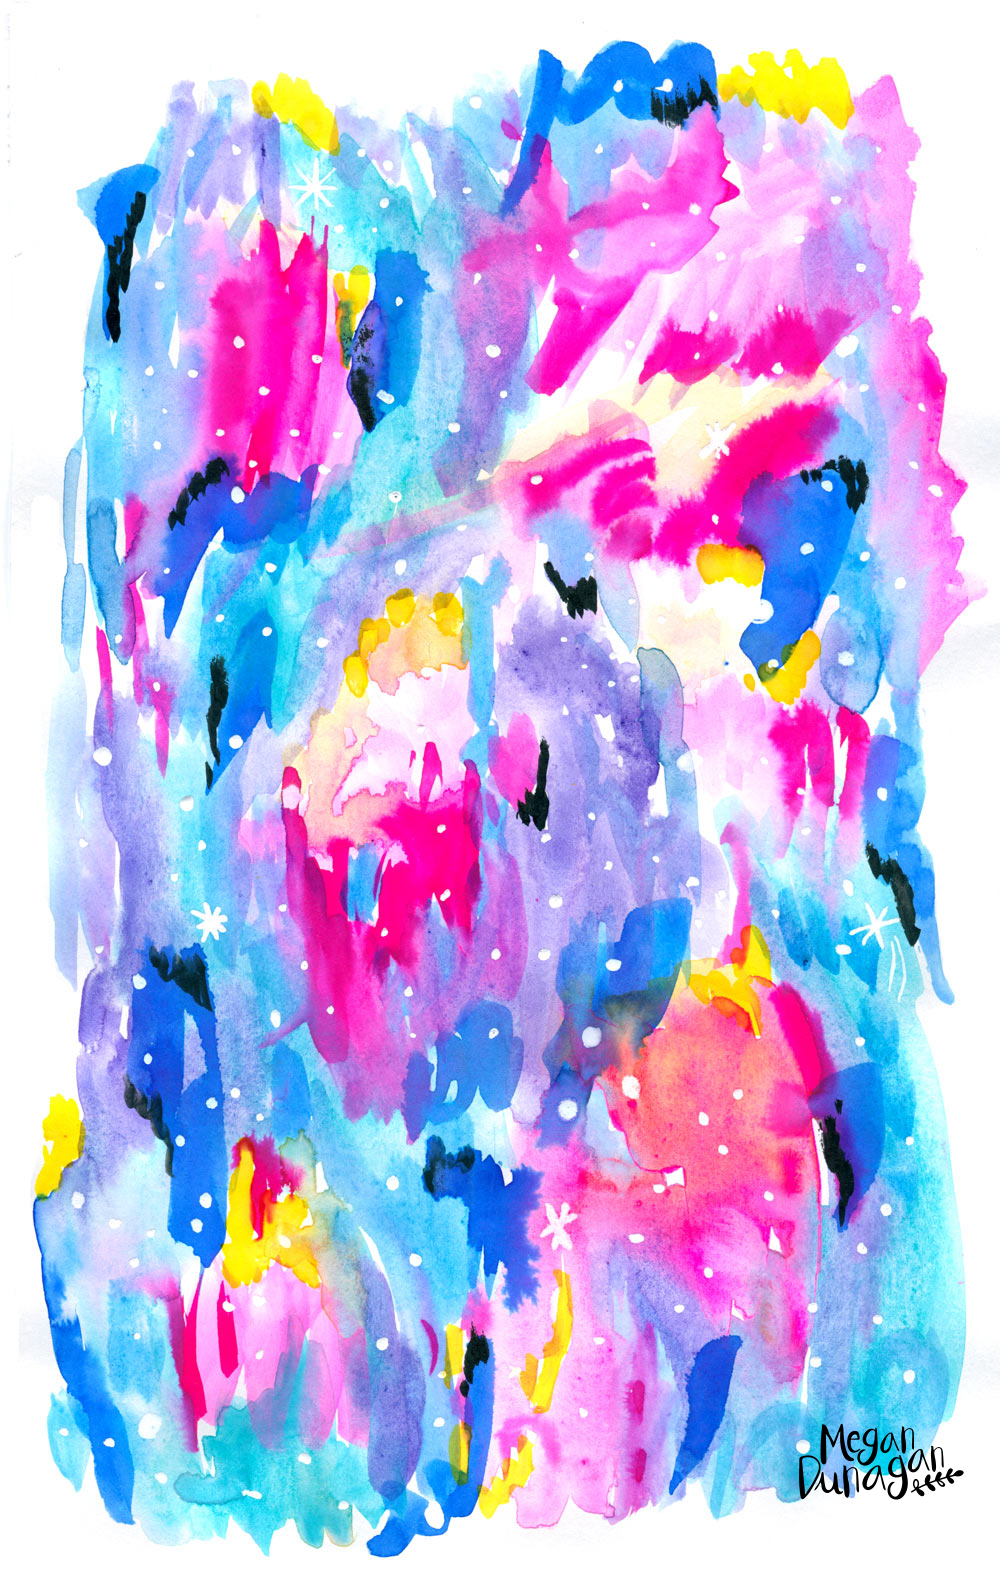 Abstract Art Aurora Borealis